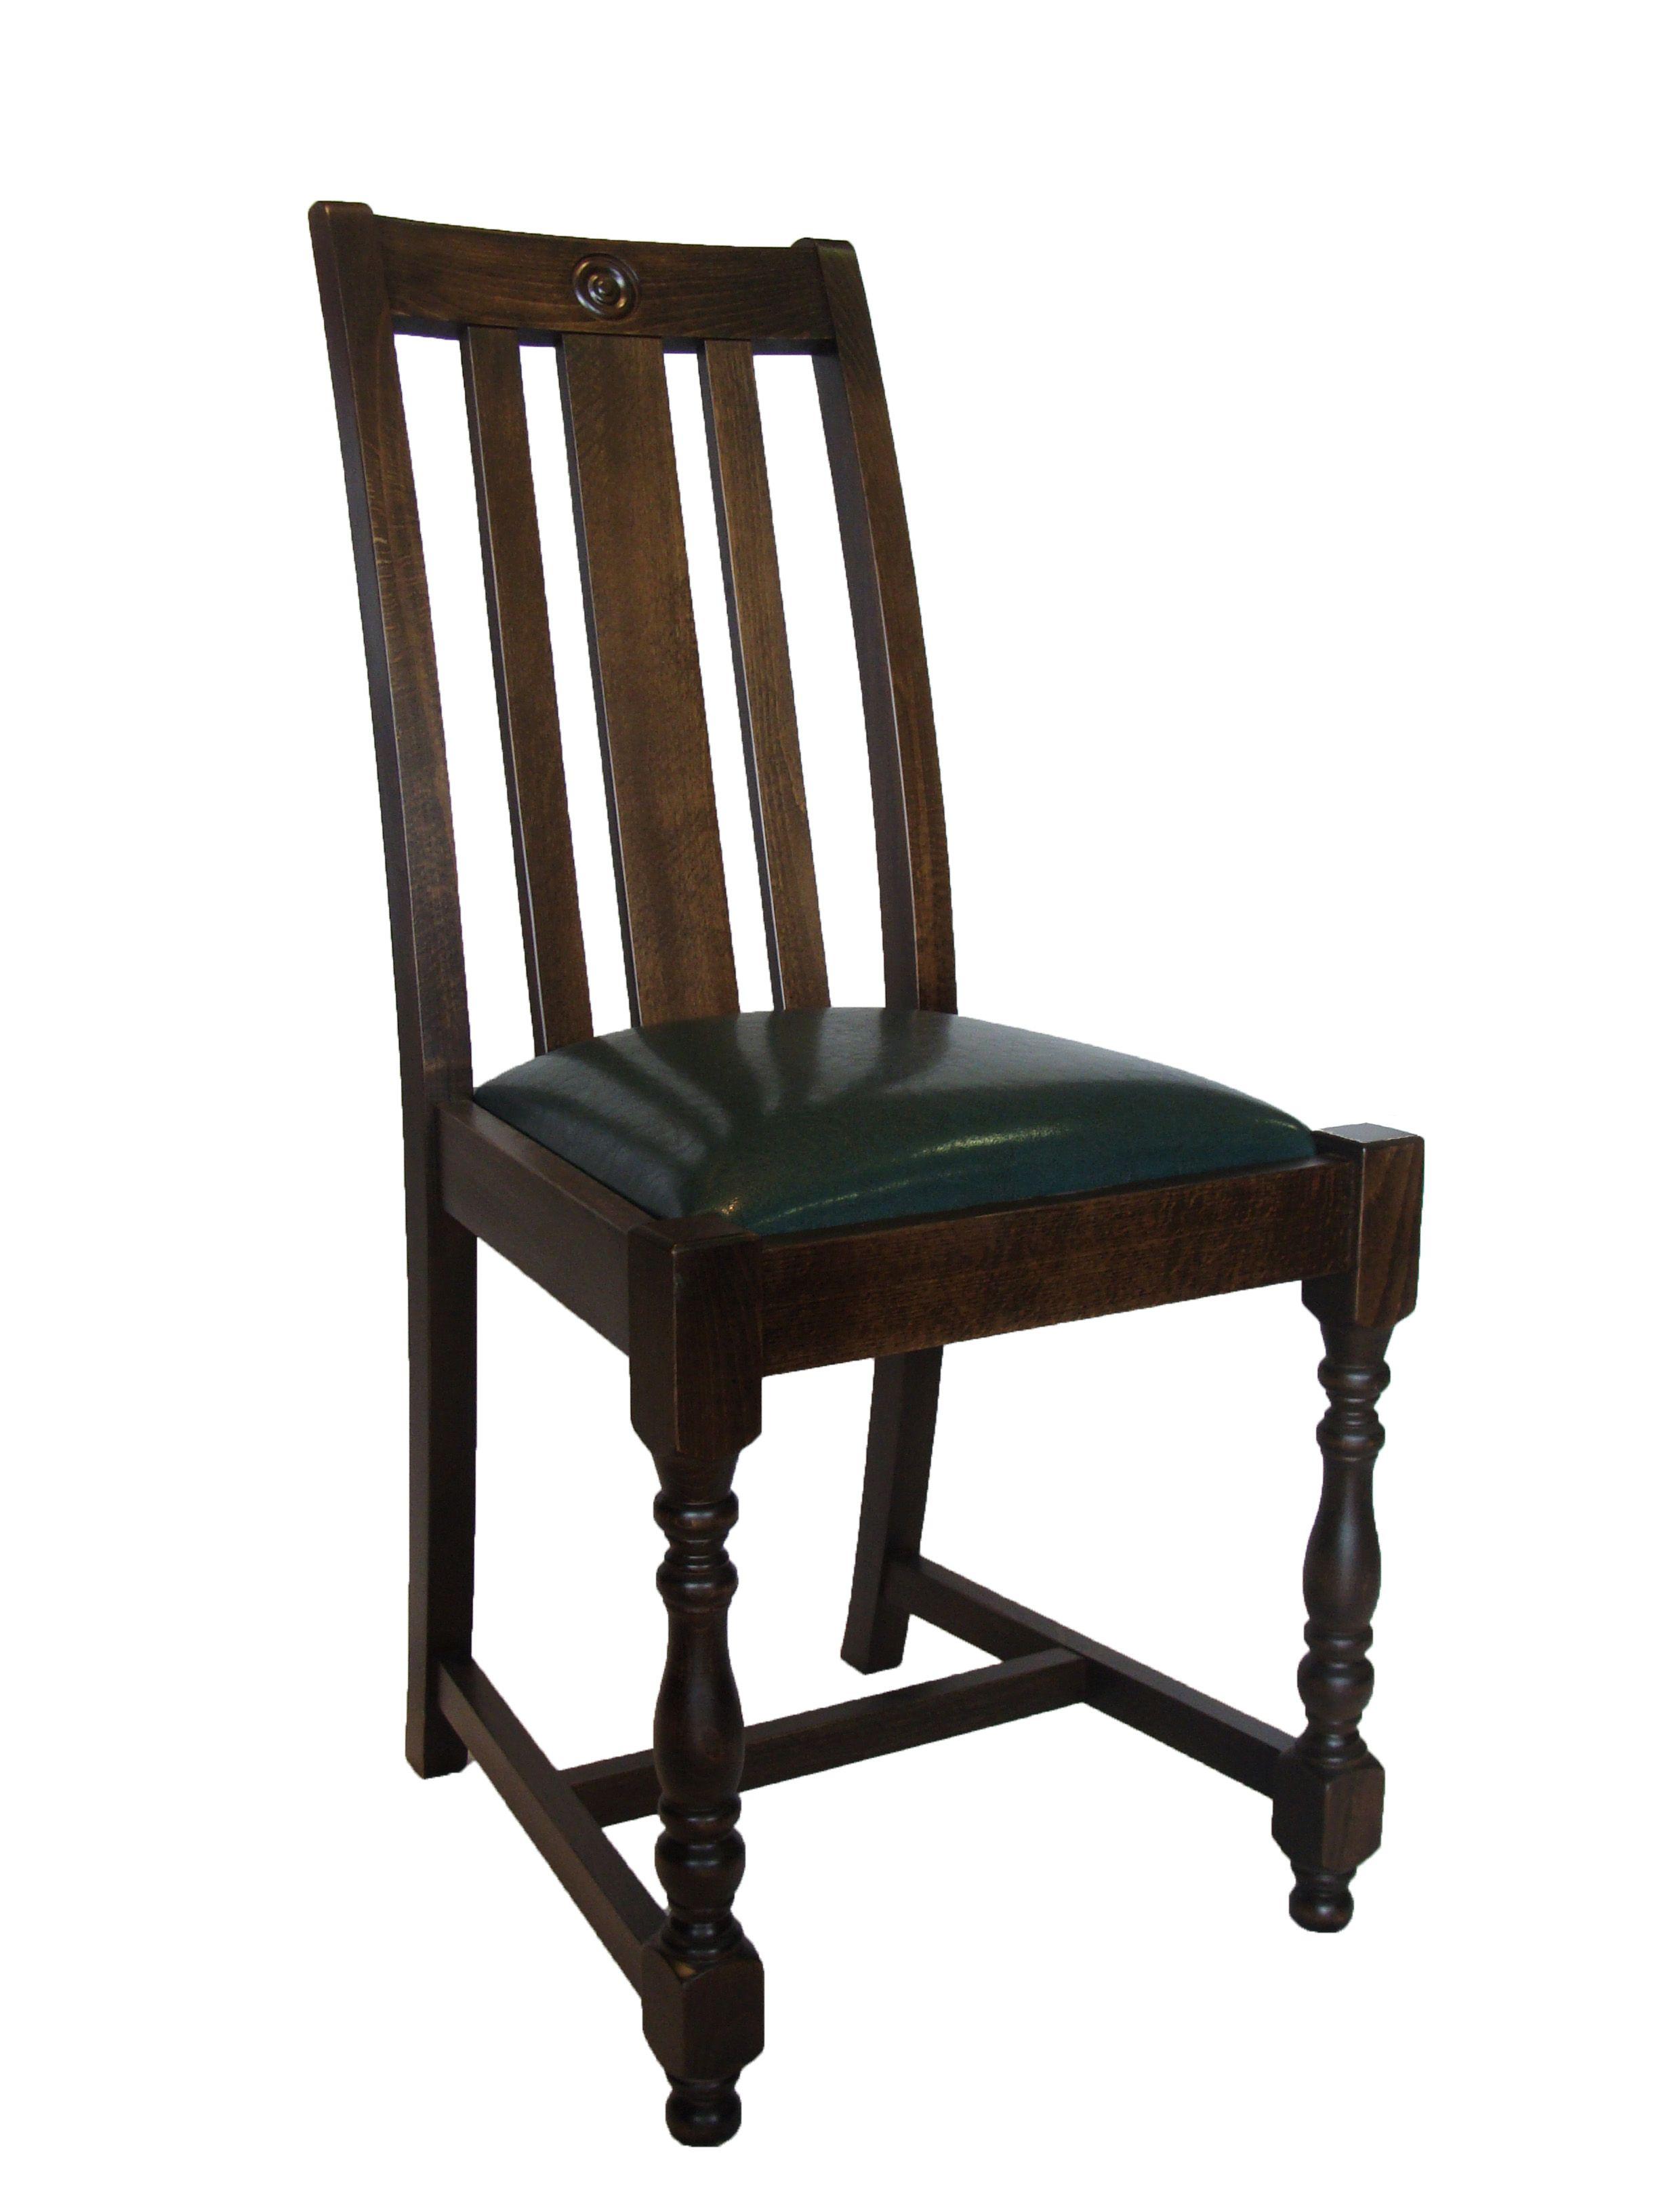 Cheap Dining Chair Shabby Chic Desk Buckingham 54 1940 39s Style Pub